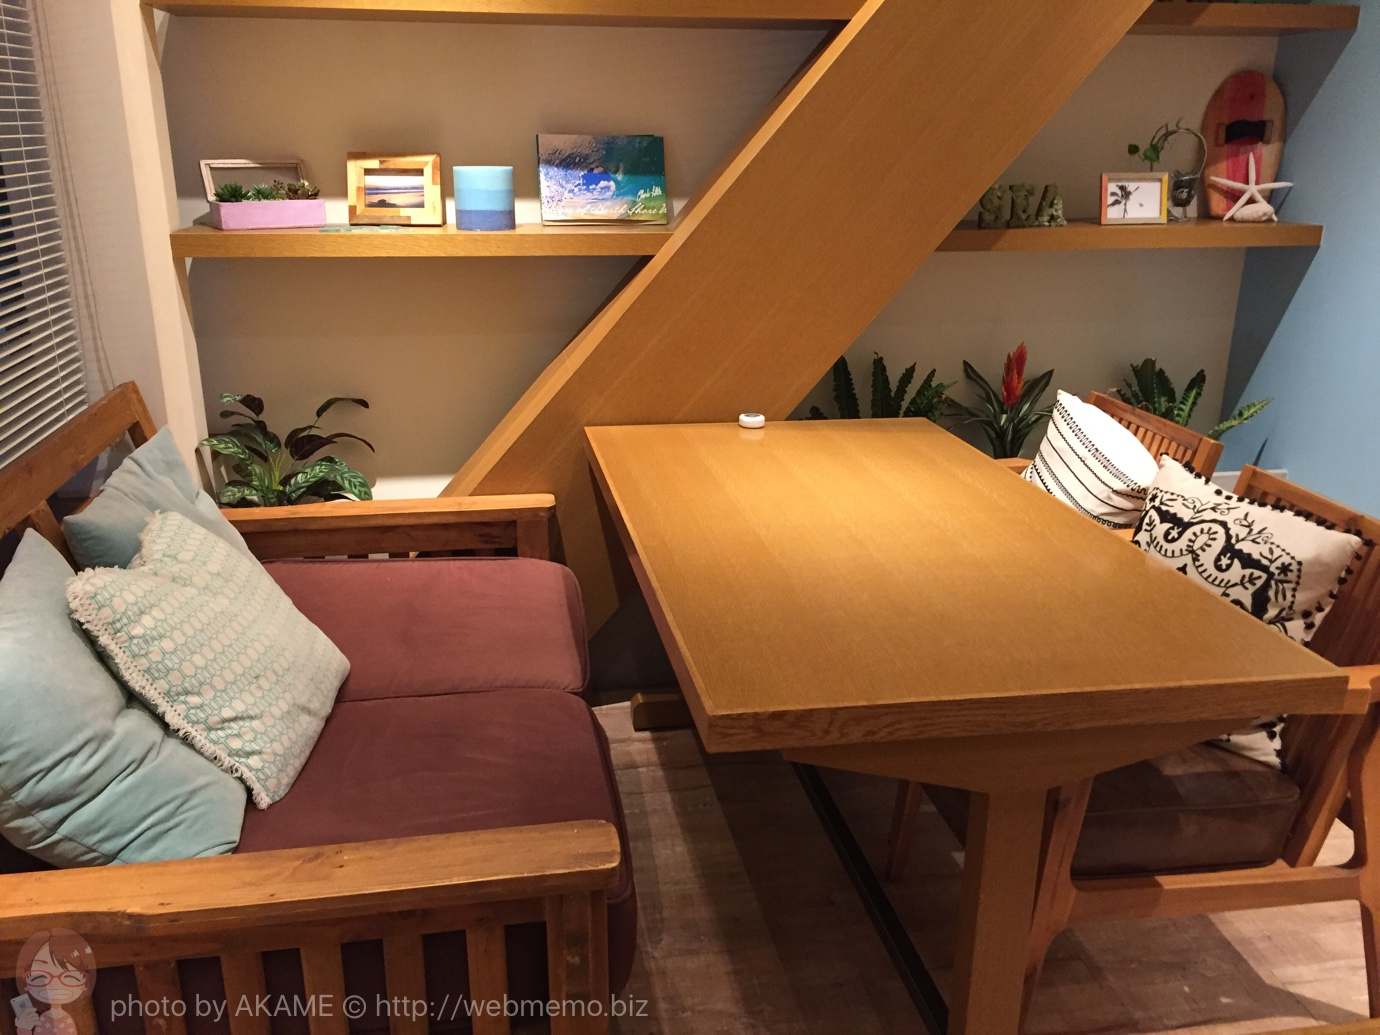 LONCAFE 鎌倉小町通り店 内装